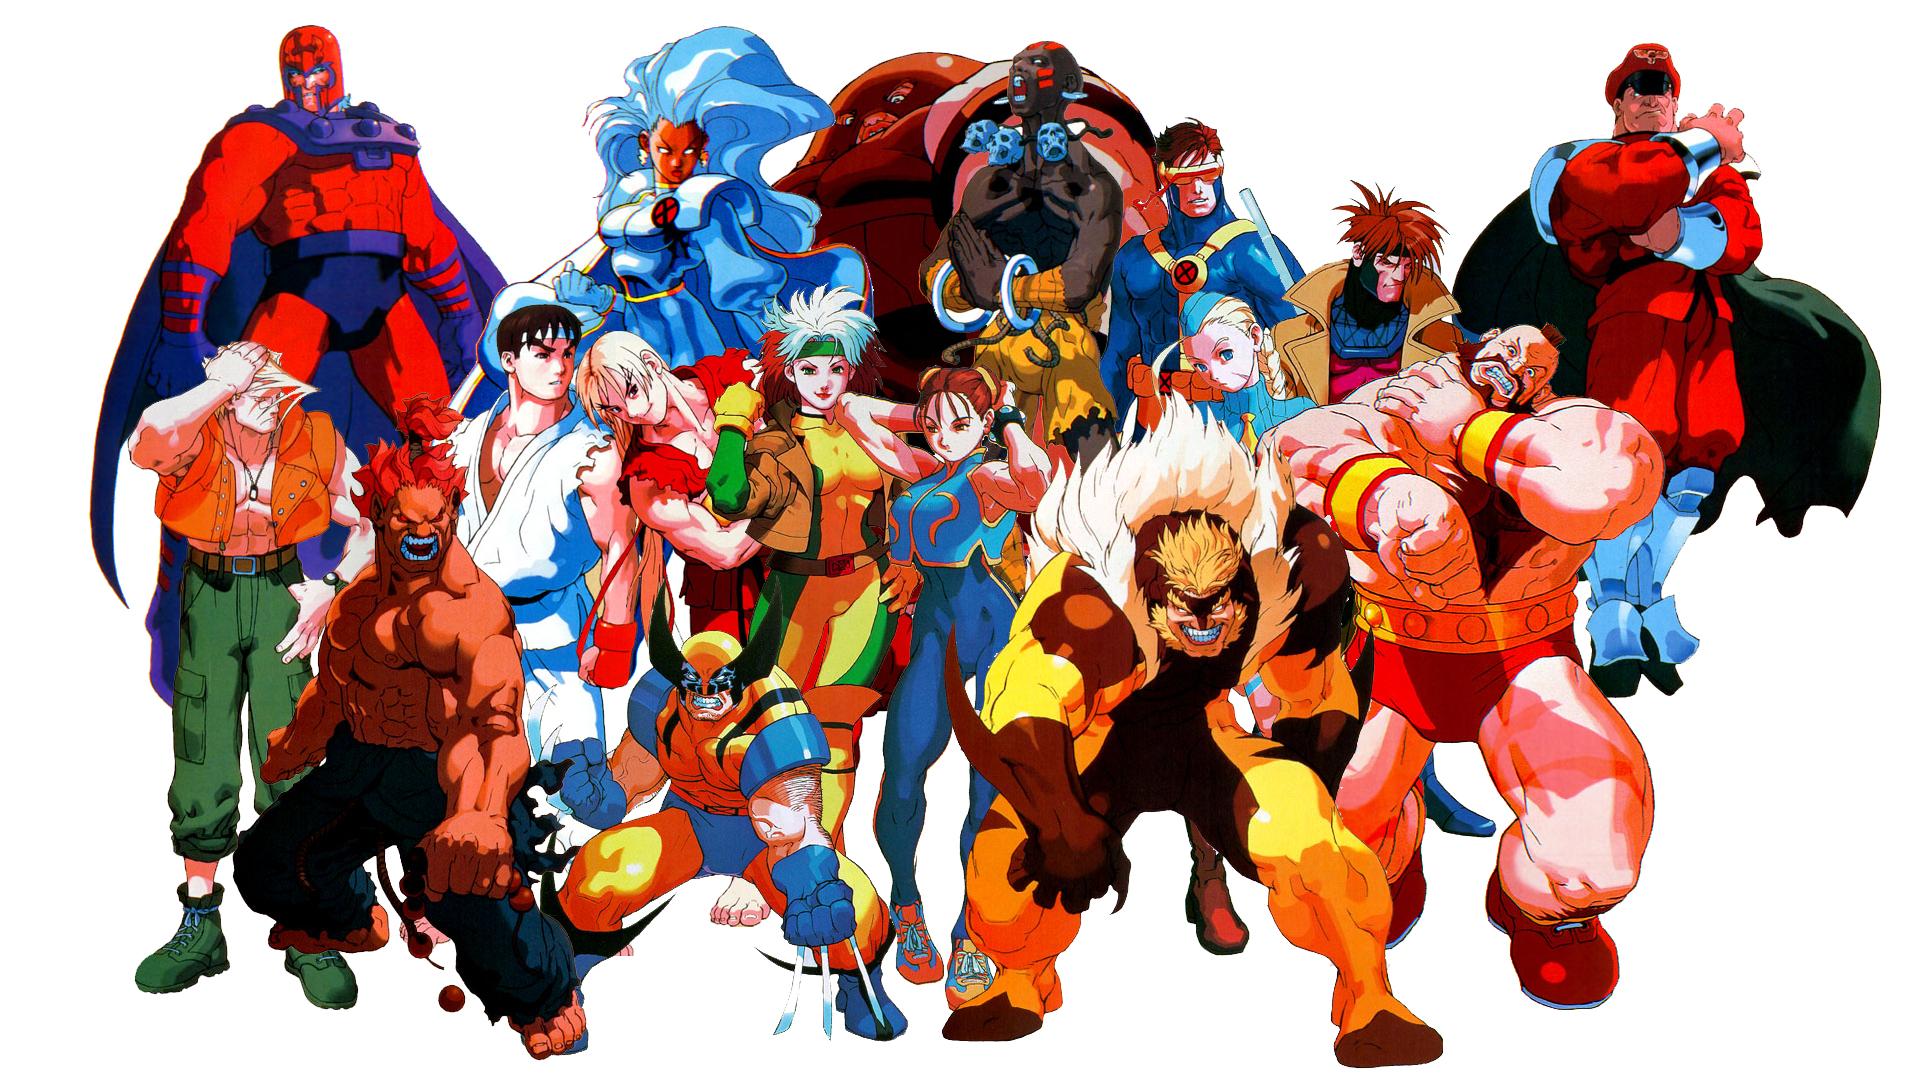 Marvel Super Heroes 60 Superhéroes: 2 Marvel Super Heroes Vs. Street Fighter HD Wallpapers